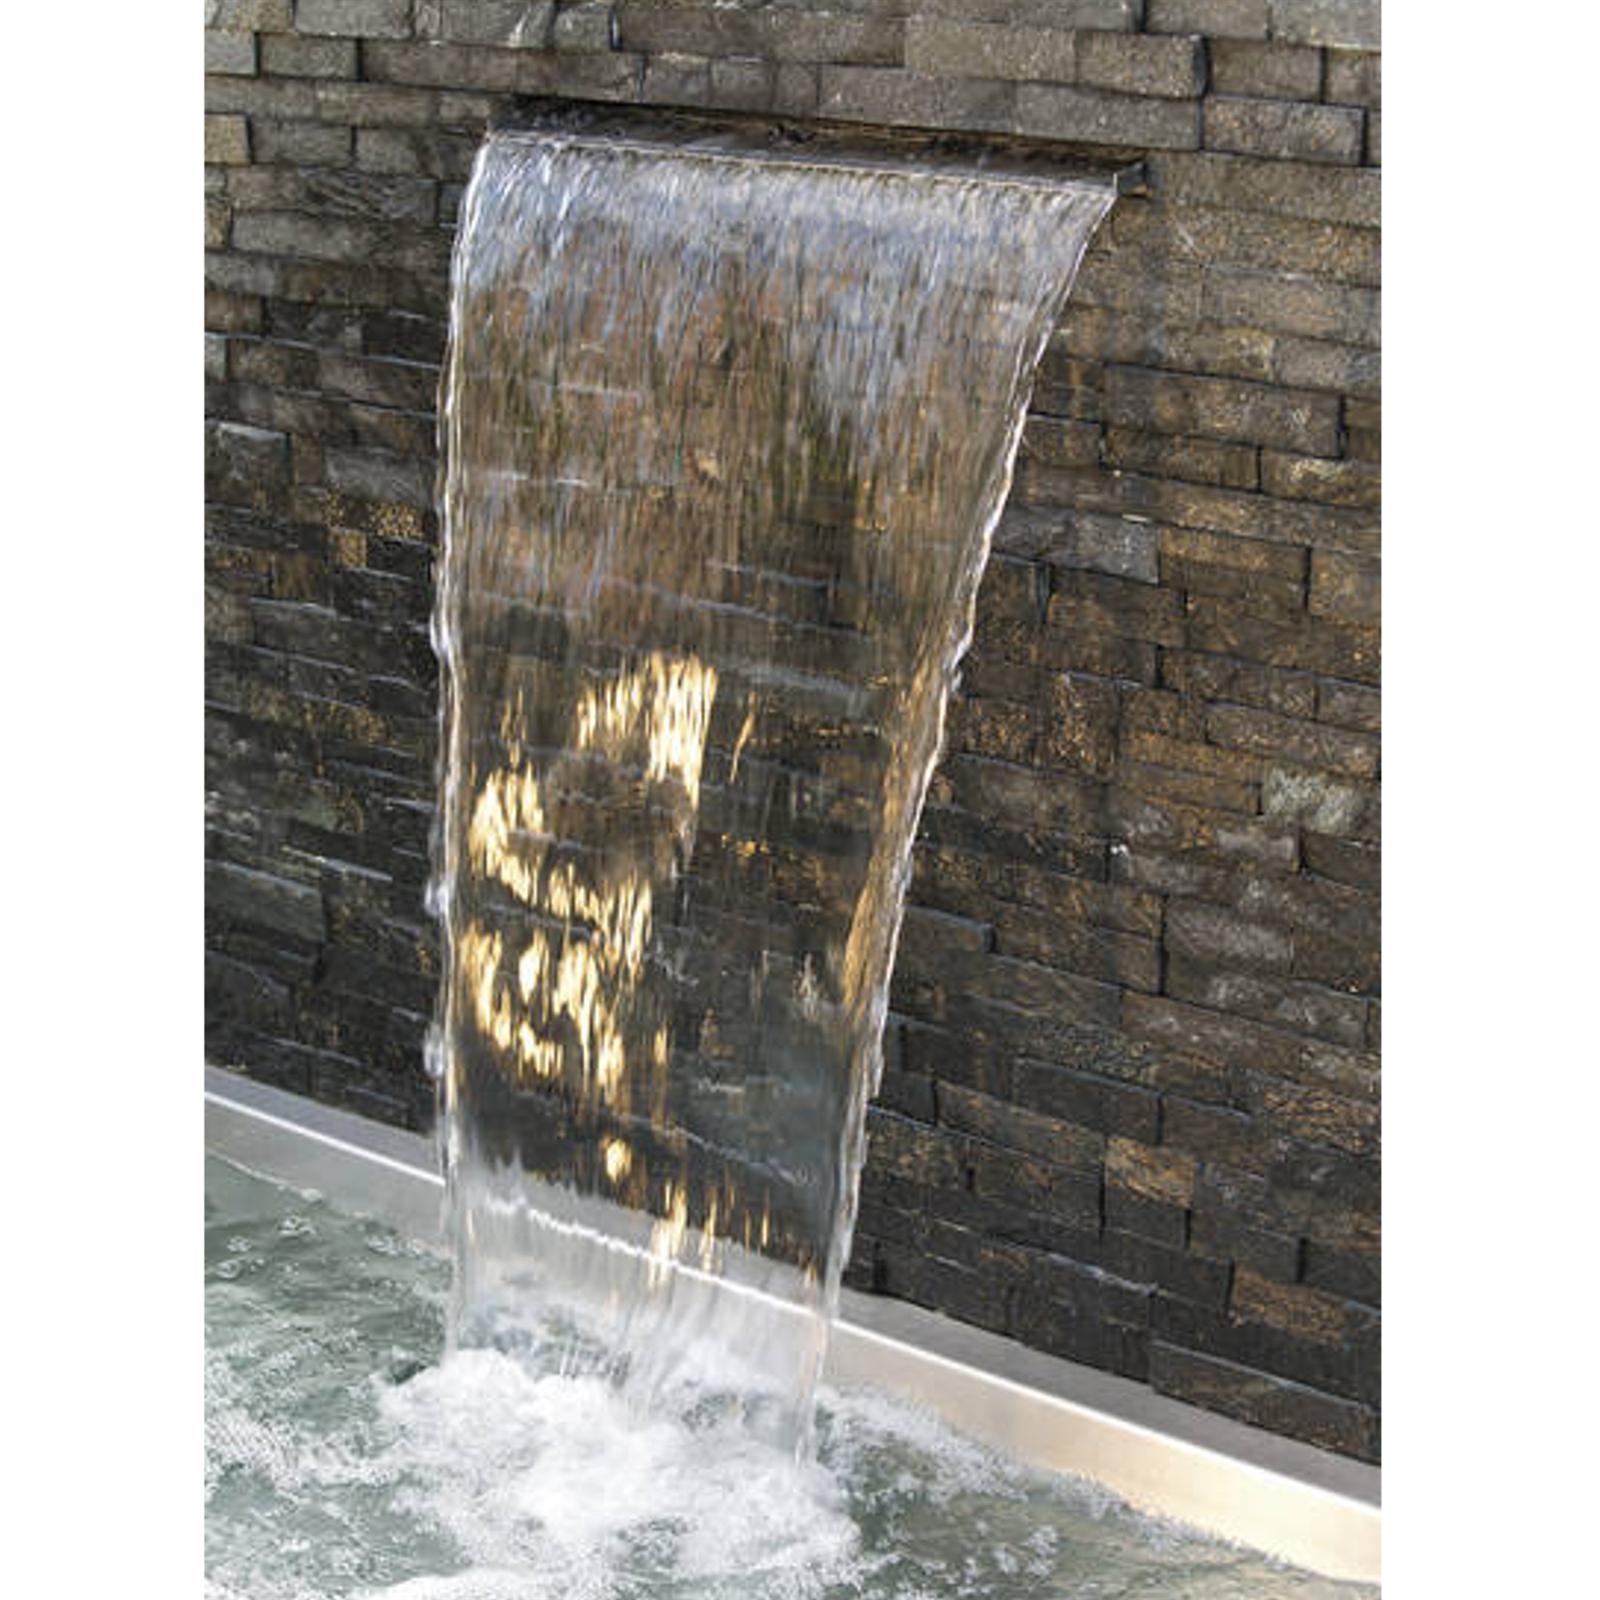 OASE POND WATERFALL BLADE 90 GARDEN CASCADE WATER FEATURE ILLUMINATION LED LIGHT